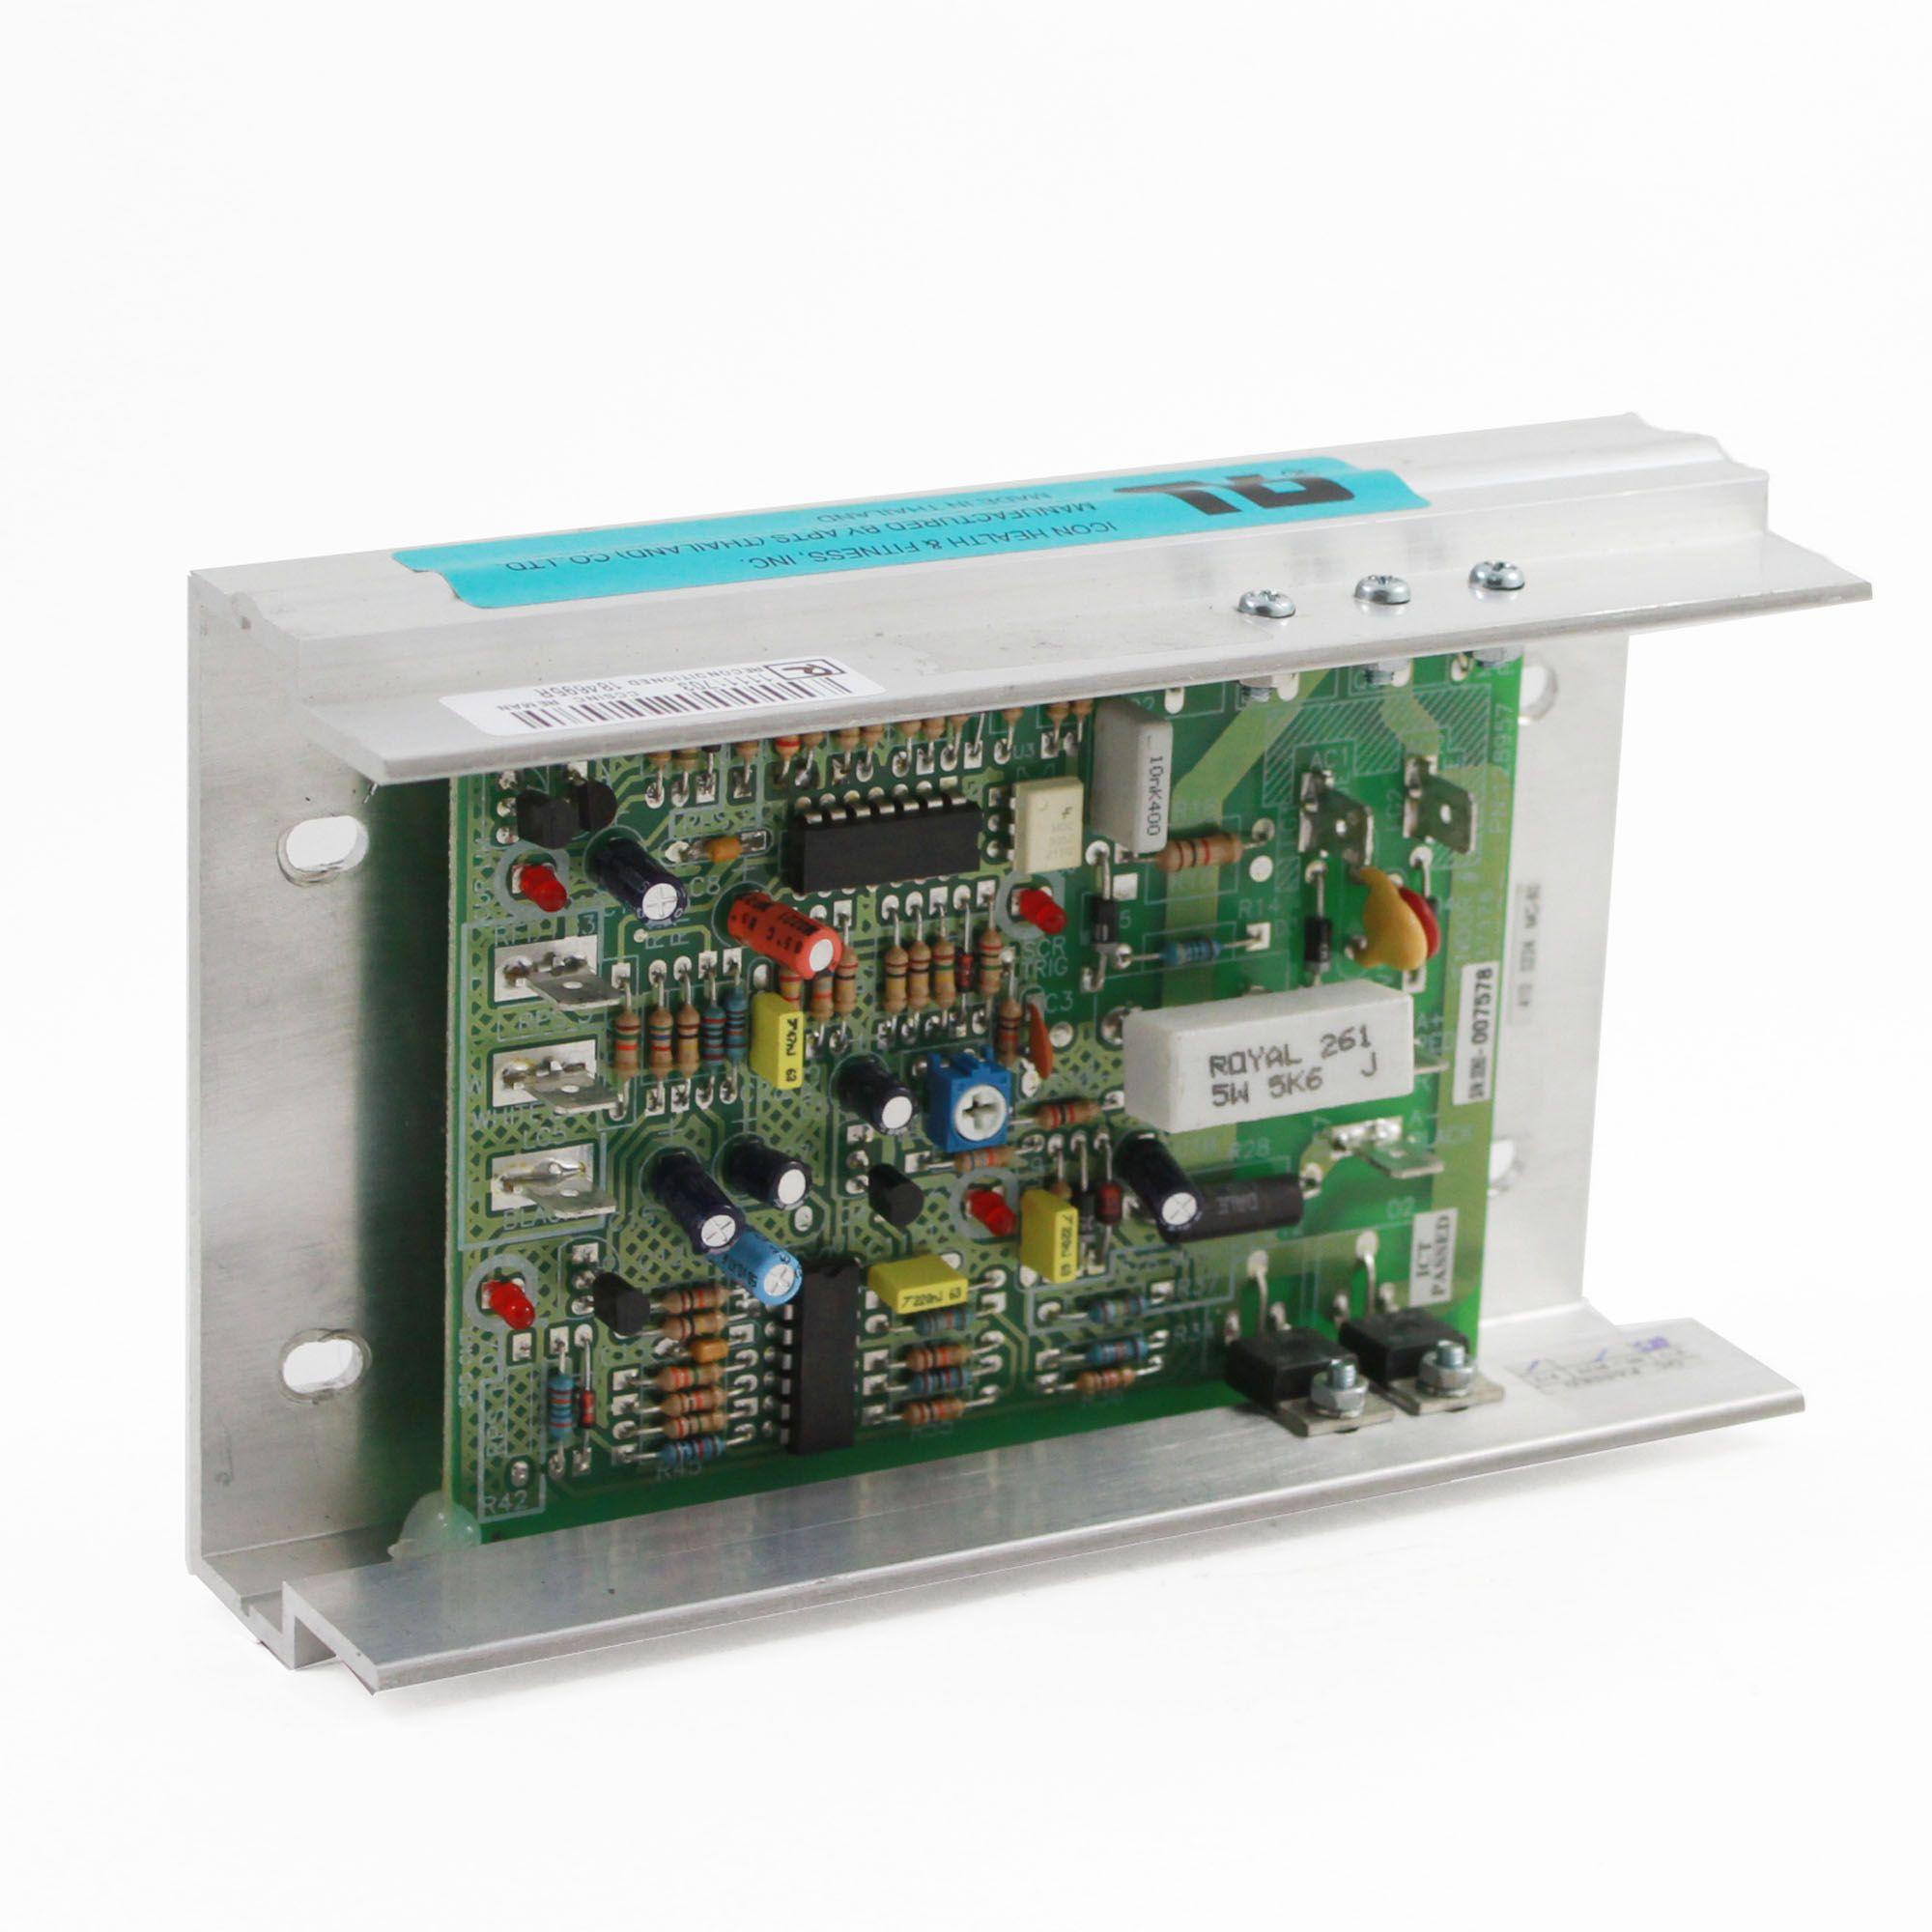 looking for nordictrack model ntl10850 treadmill repair & replacement parts?